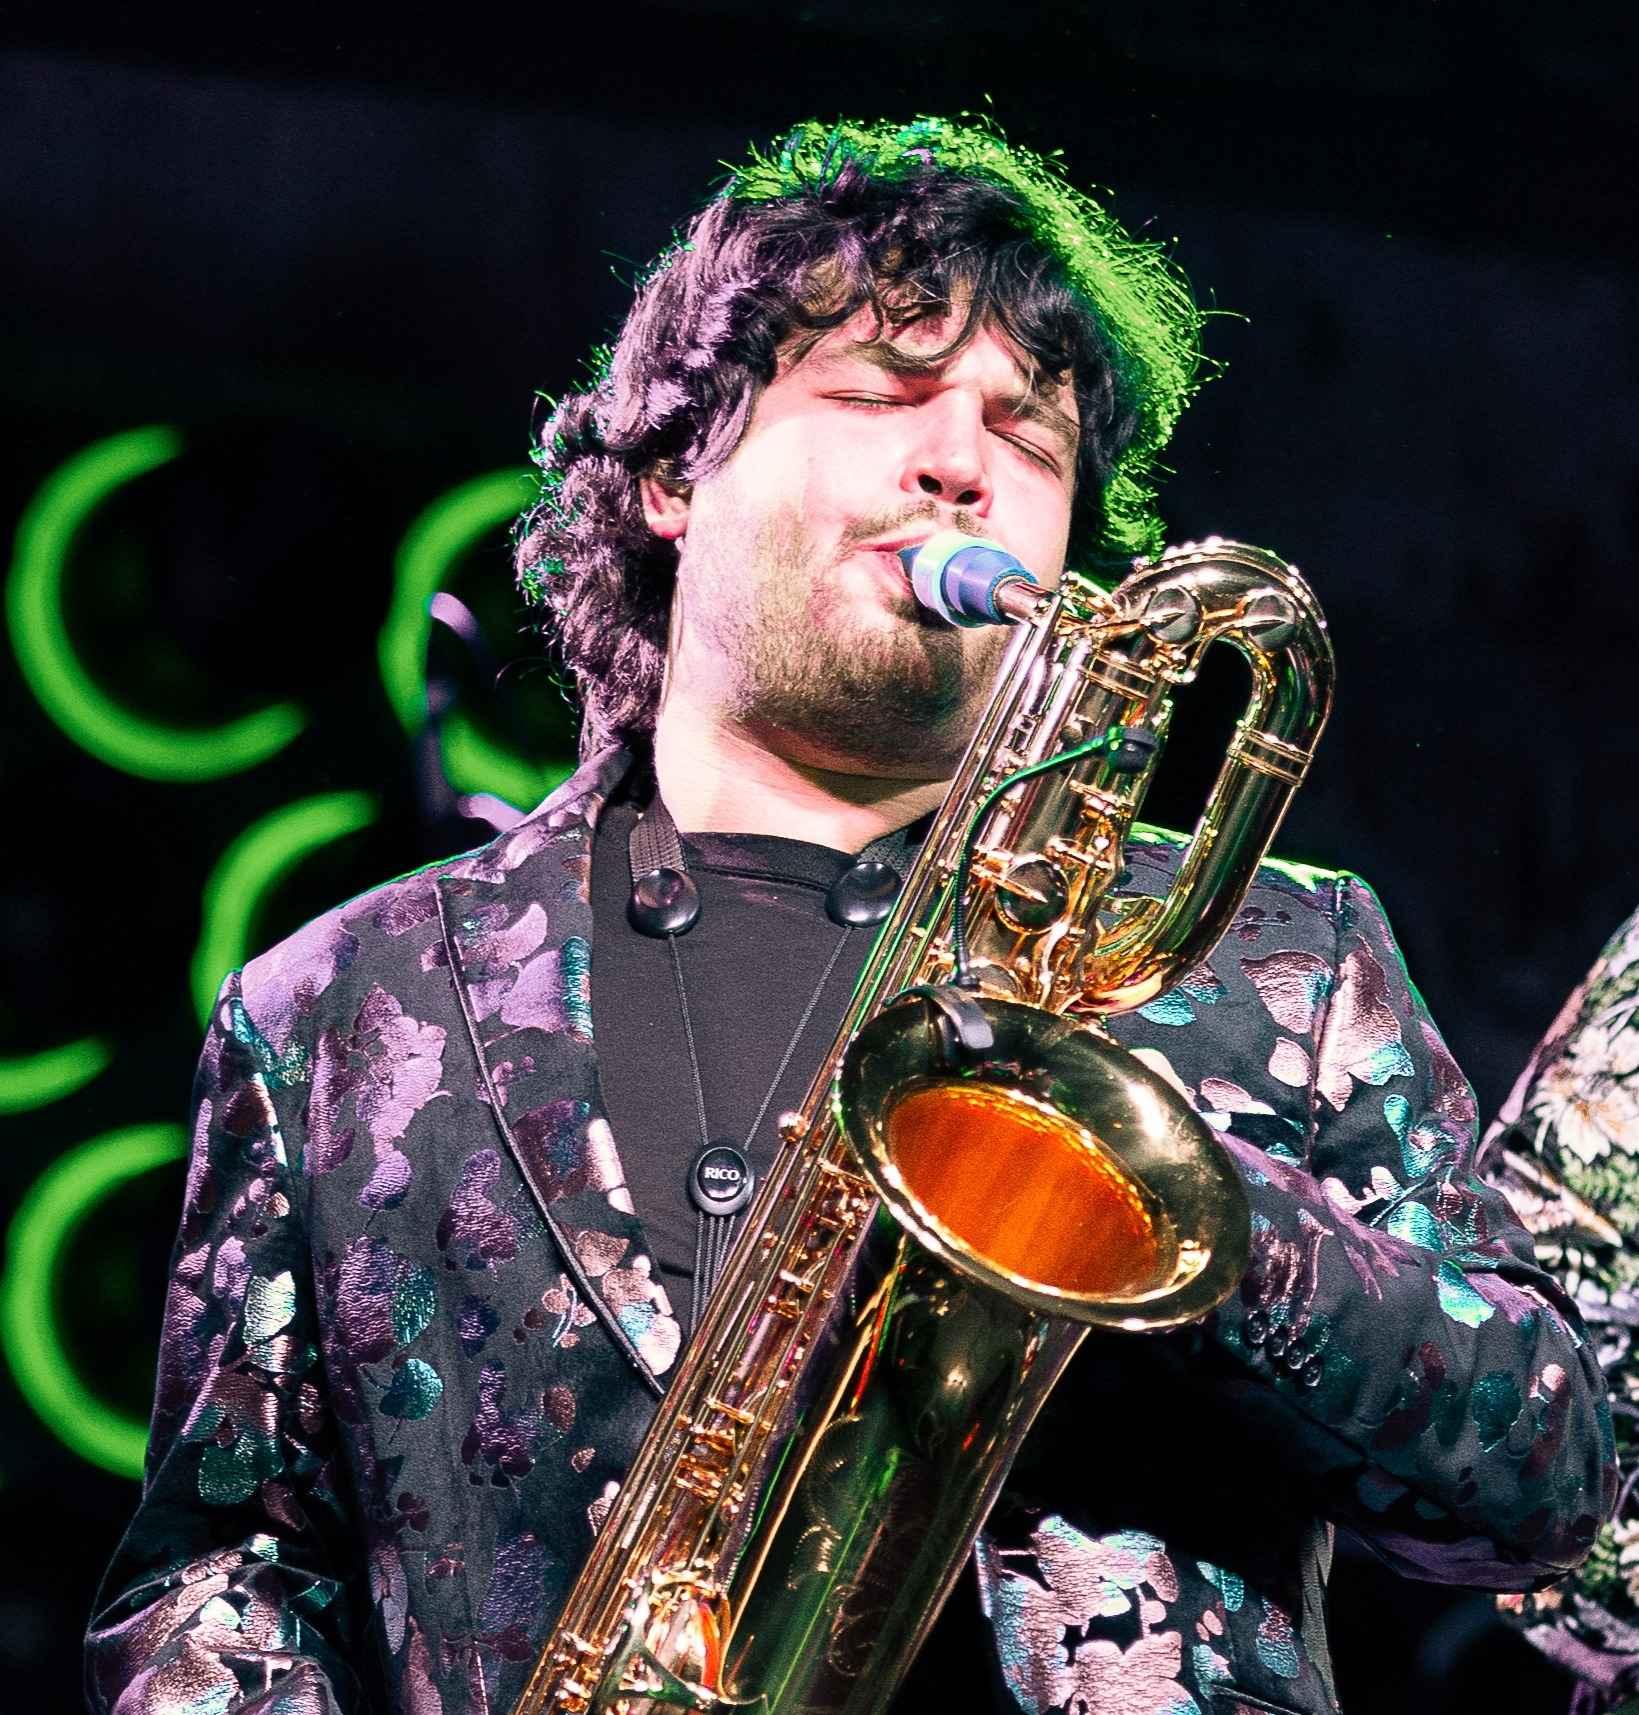 Adrian Condis plays Syos on baritone saxophone